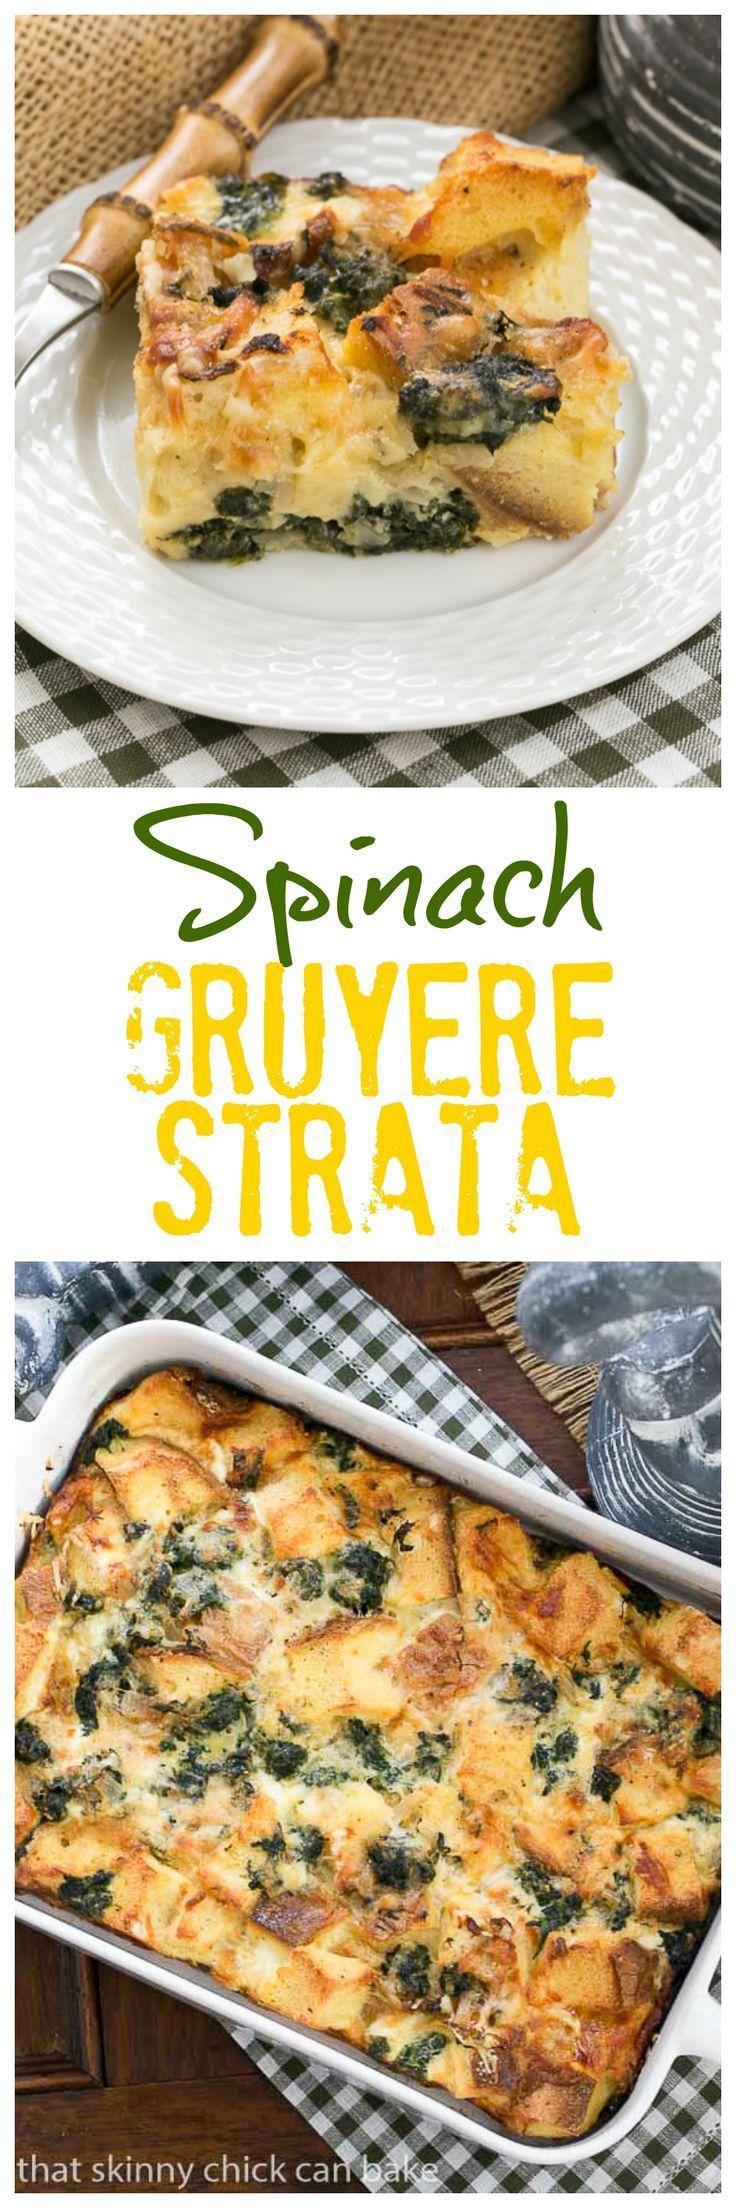 Gruyere Spinach Strata | A terrific cheesy breakfast casserole made with bread, Swiss Gruyere and spinach! /lizzydo/